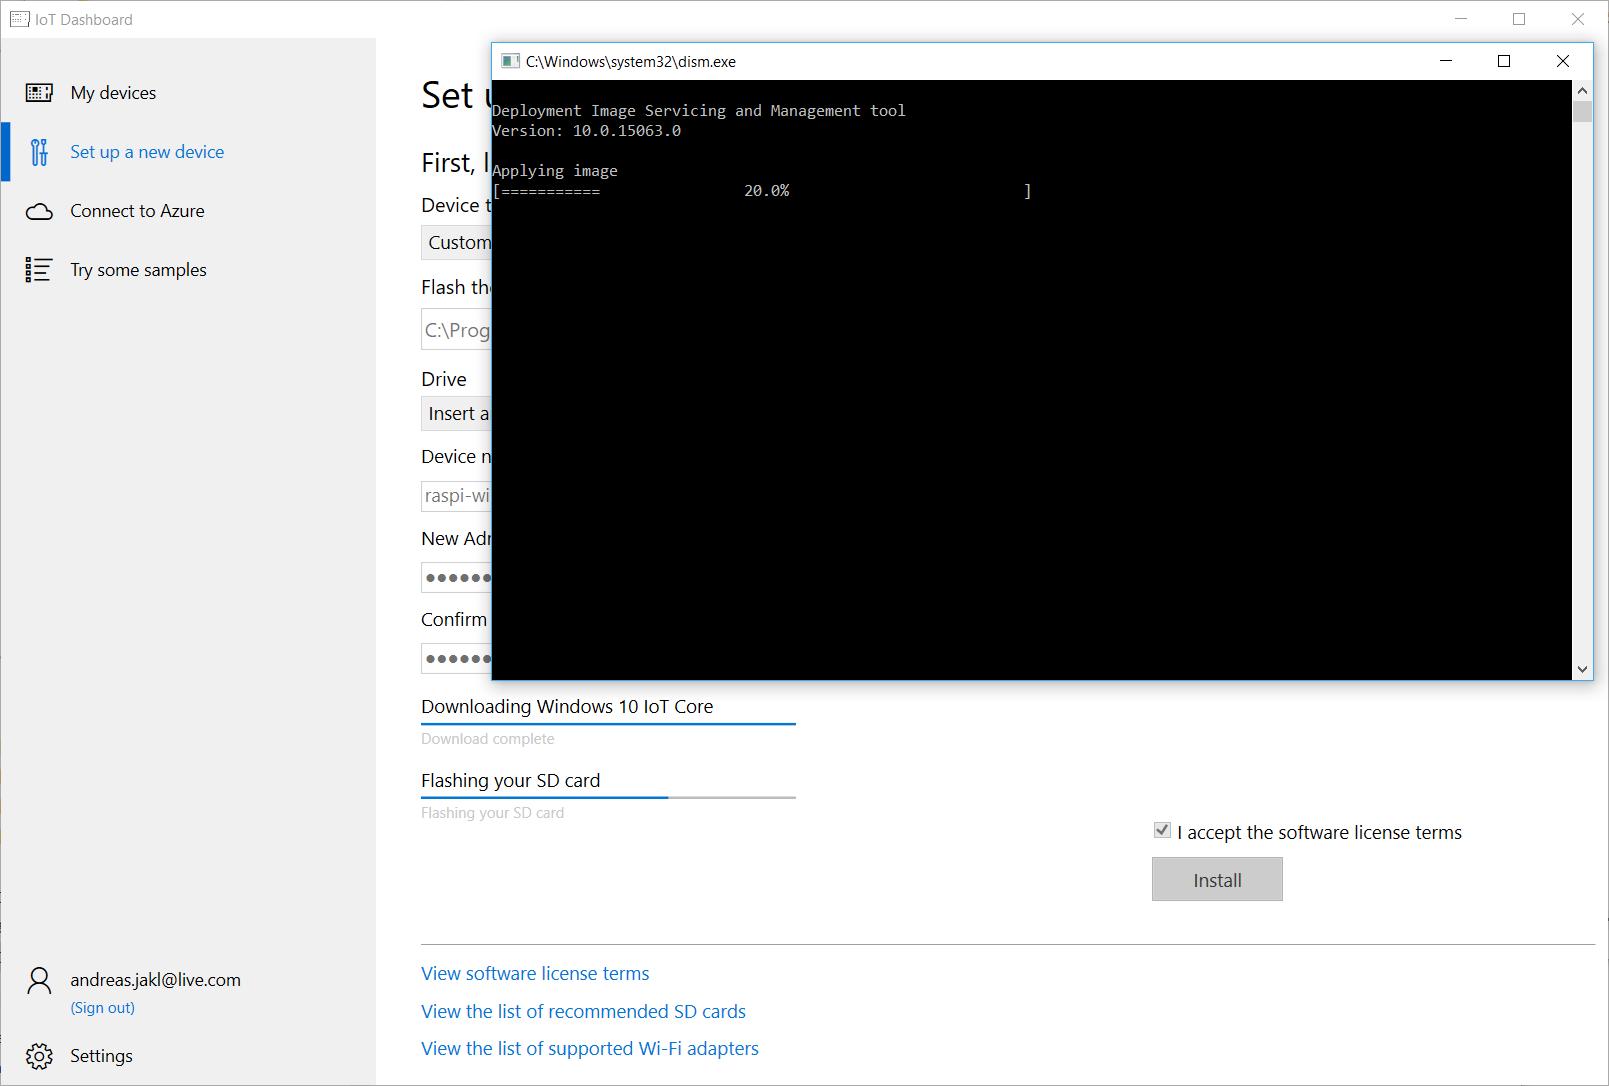 Installing Windows 10 IoT Core on a Raspberry Pi